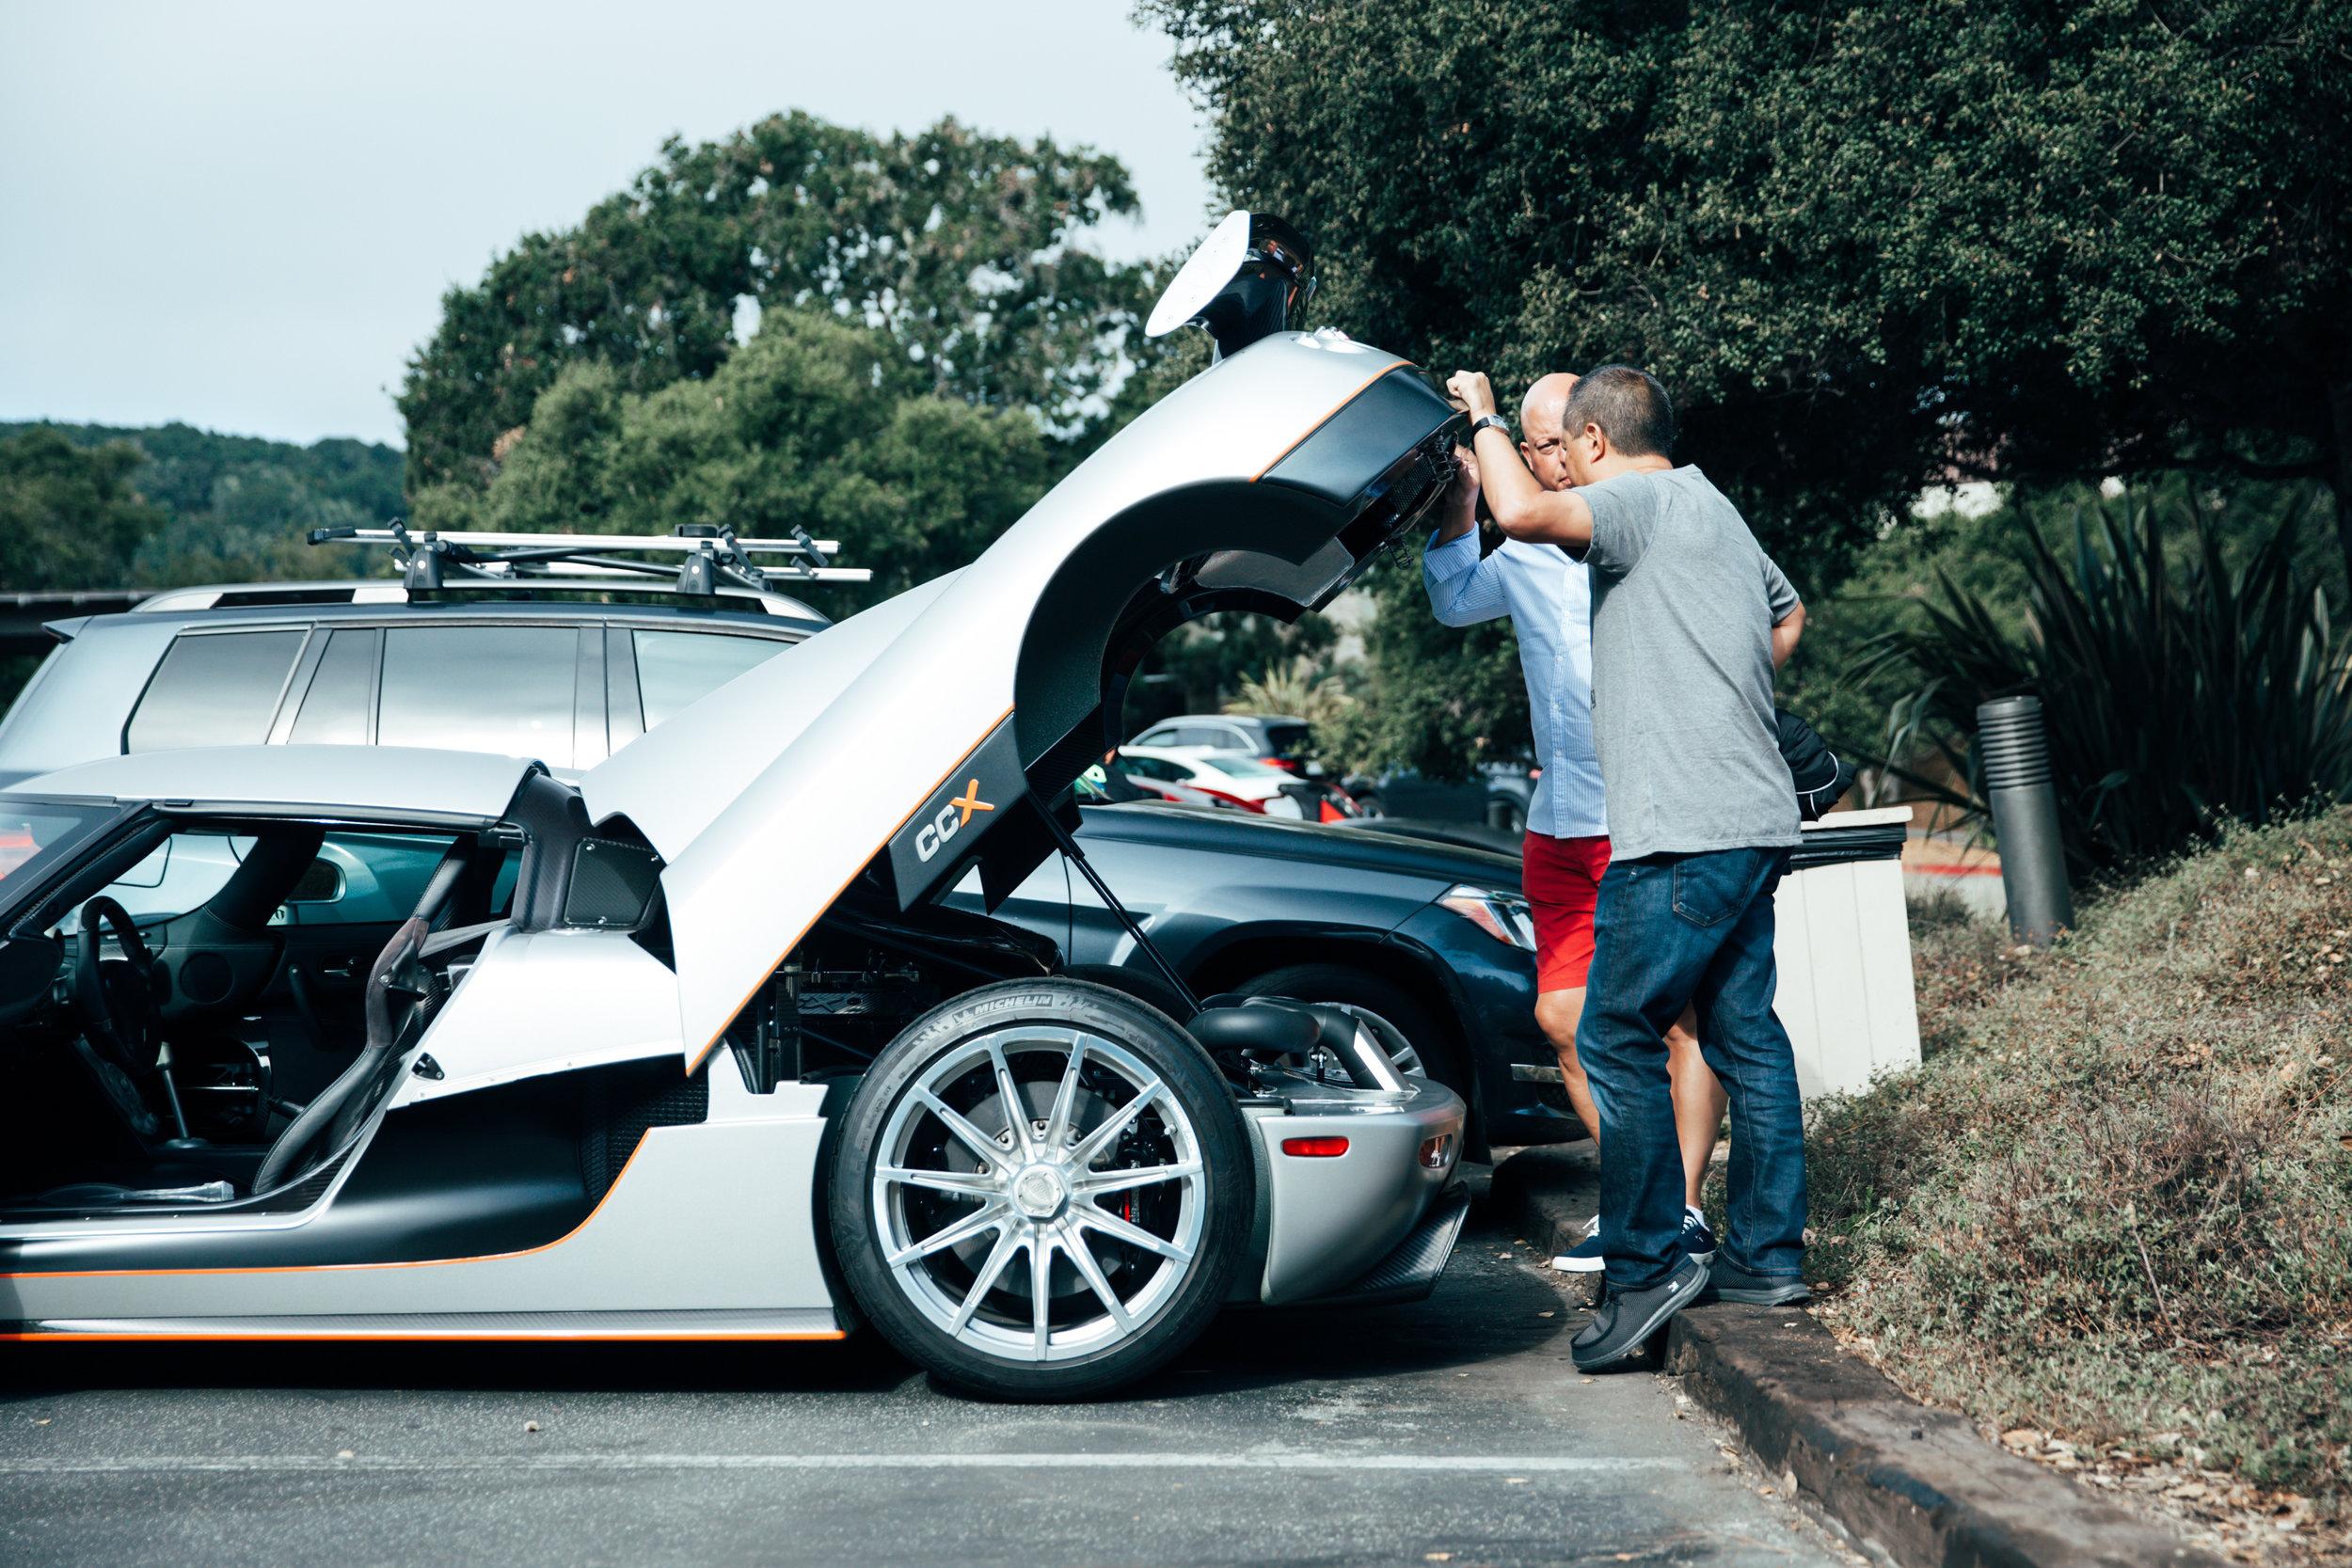 Stay_Driven_Monterey_Car_Week_Koenigsegg-5.jpg